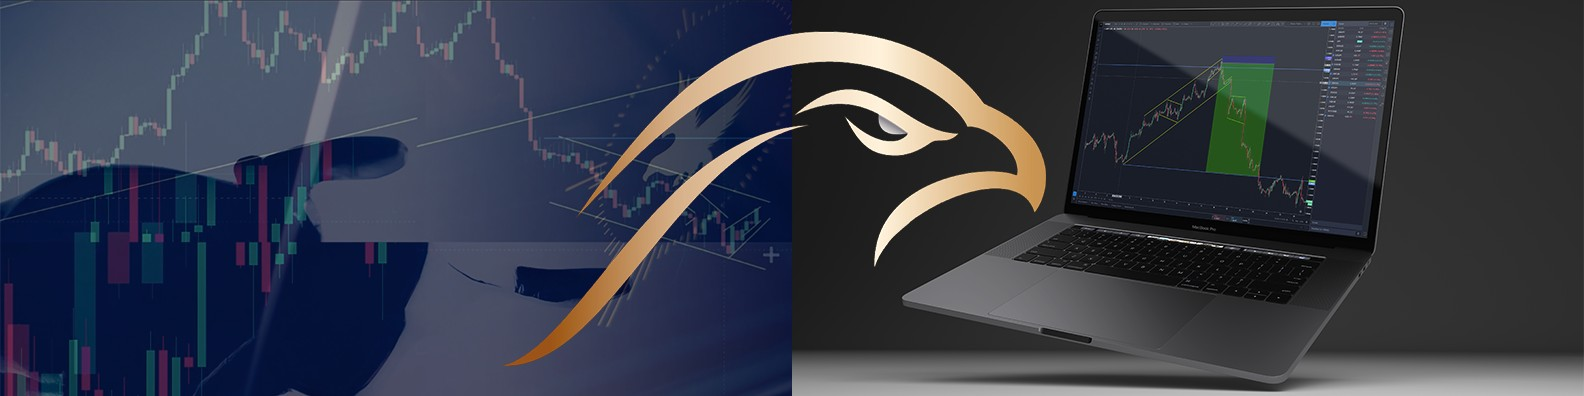 falcon trading systems ltd